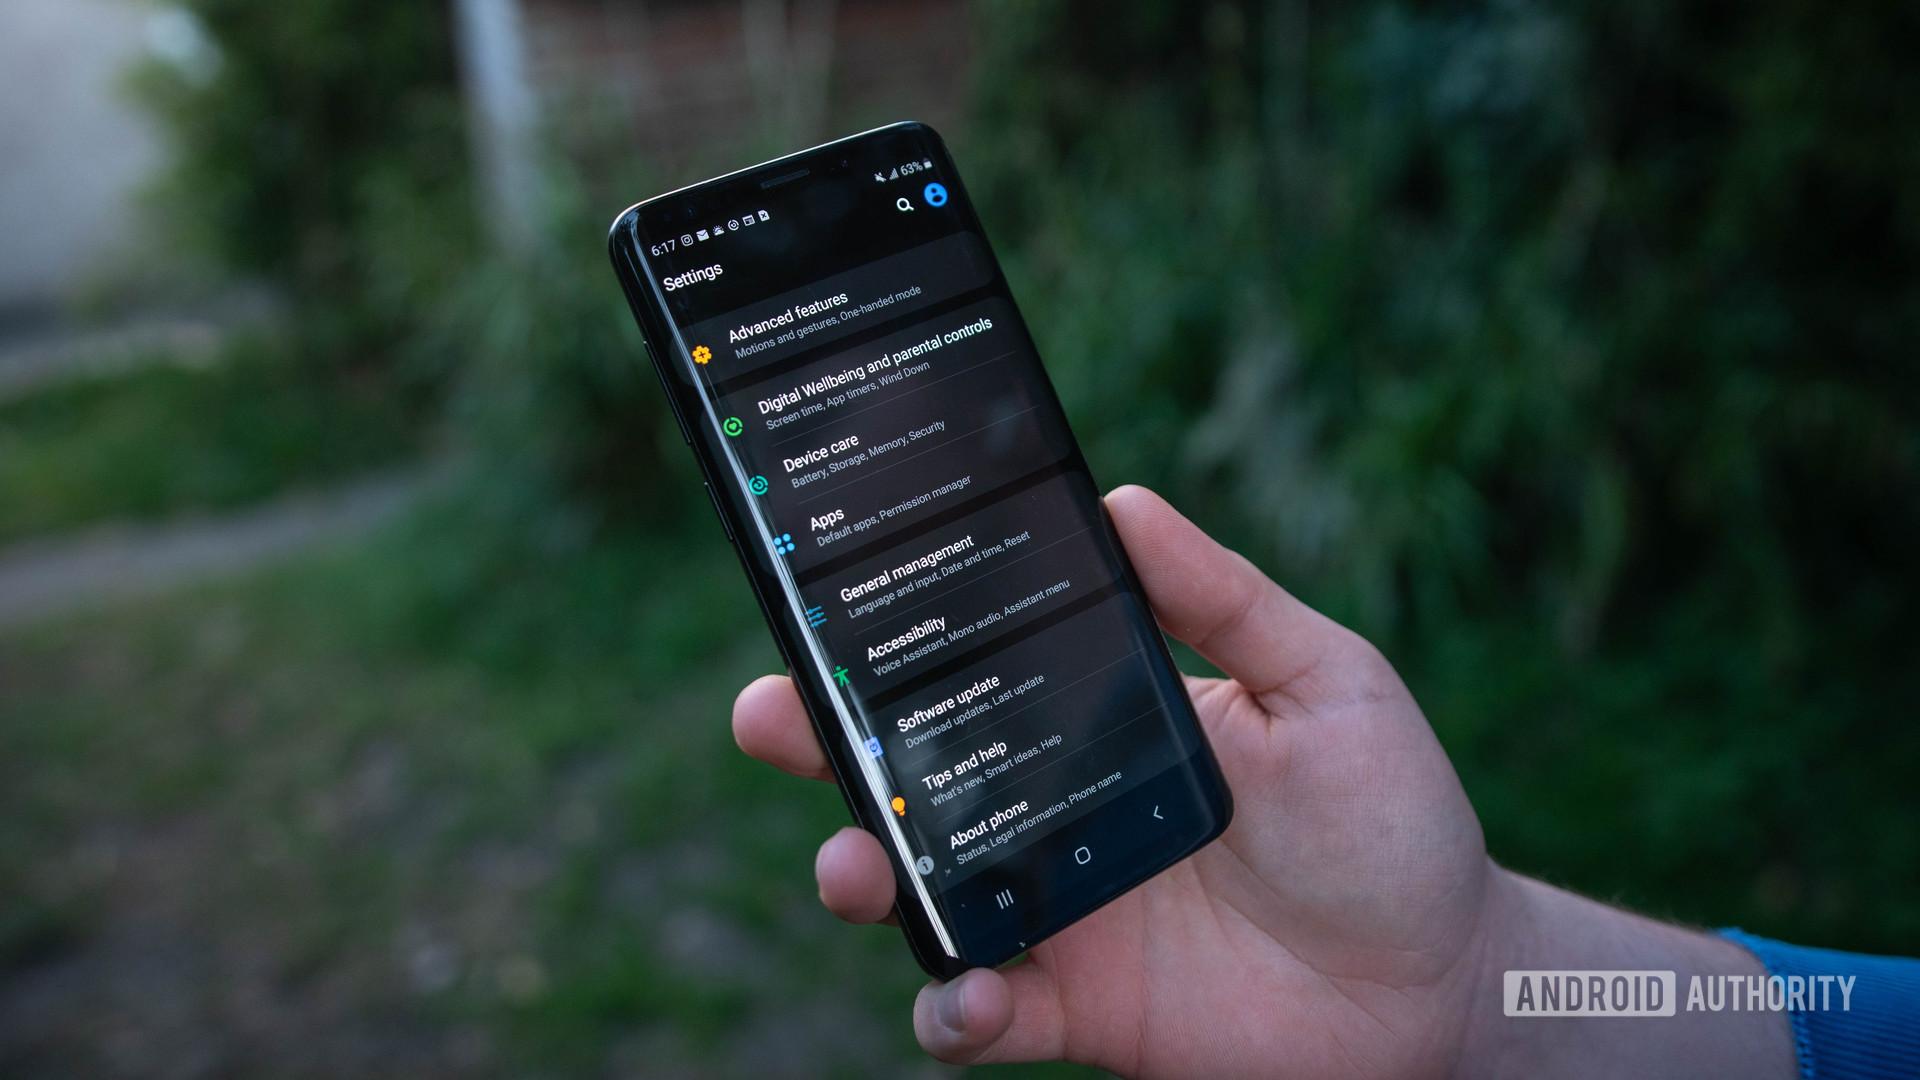 Galaxy S9 Plus Settings menu